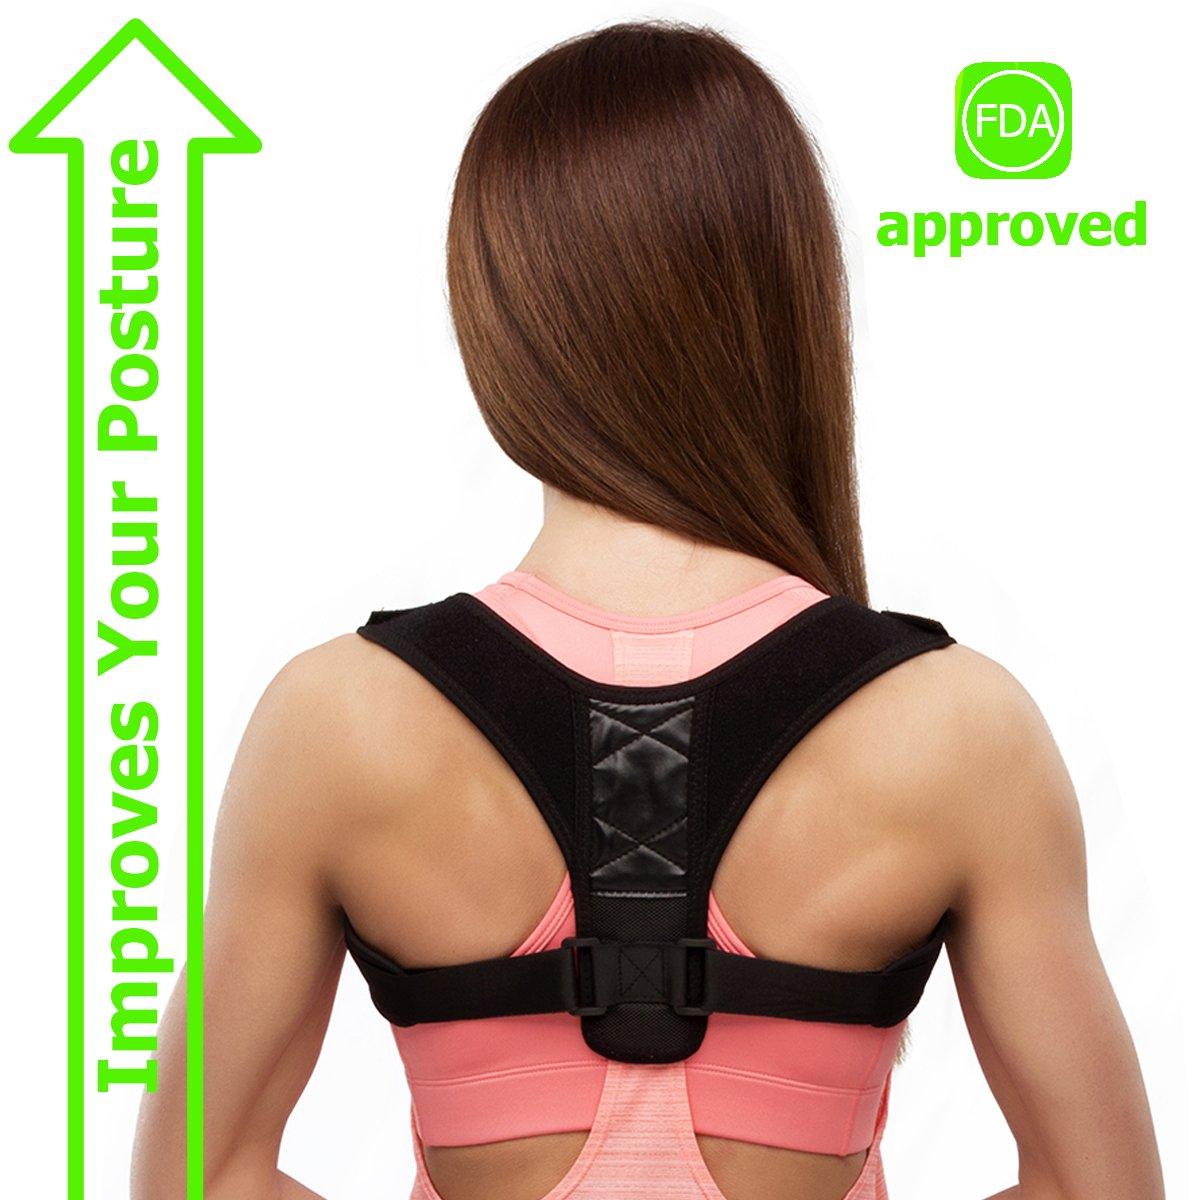 Back Posture Corrector for Men - Adjustable Shoulder Posture Corrector Brace for Women - Medical Posture Brace for Clavicle Support and Upper Back Correction for Adults